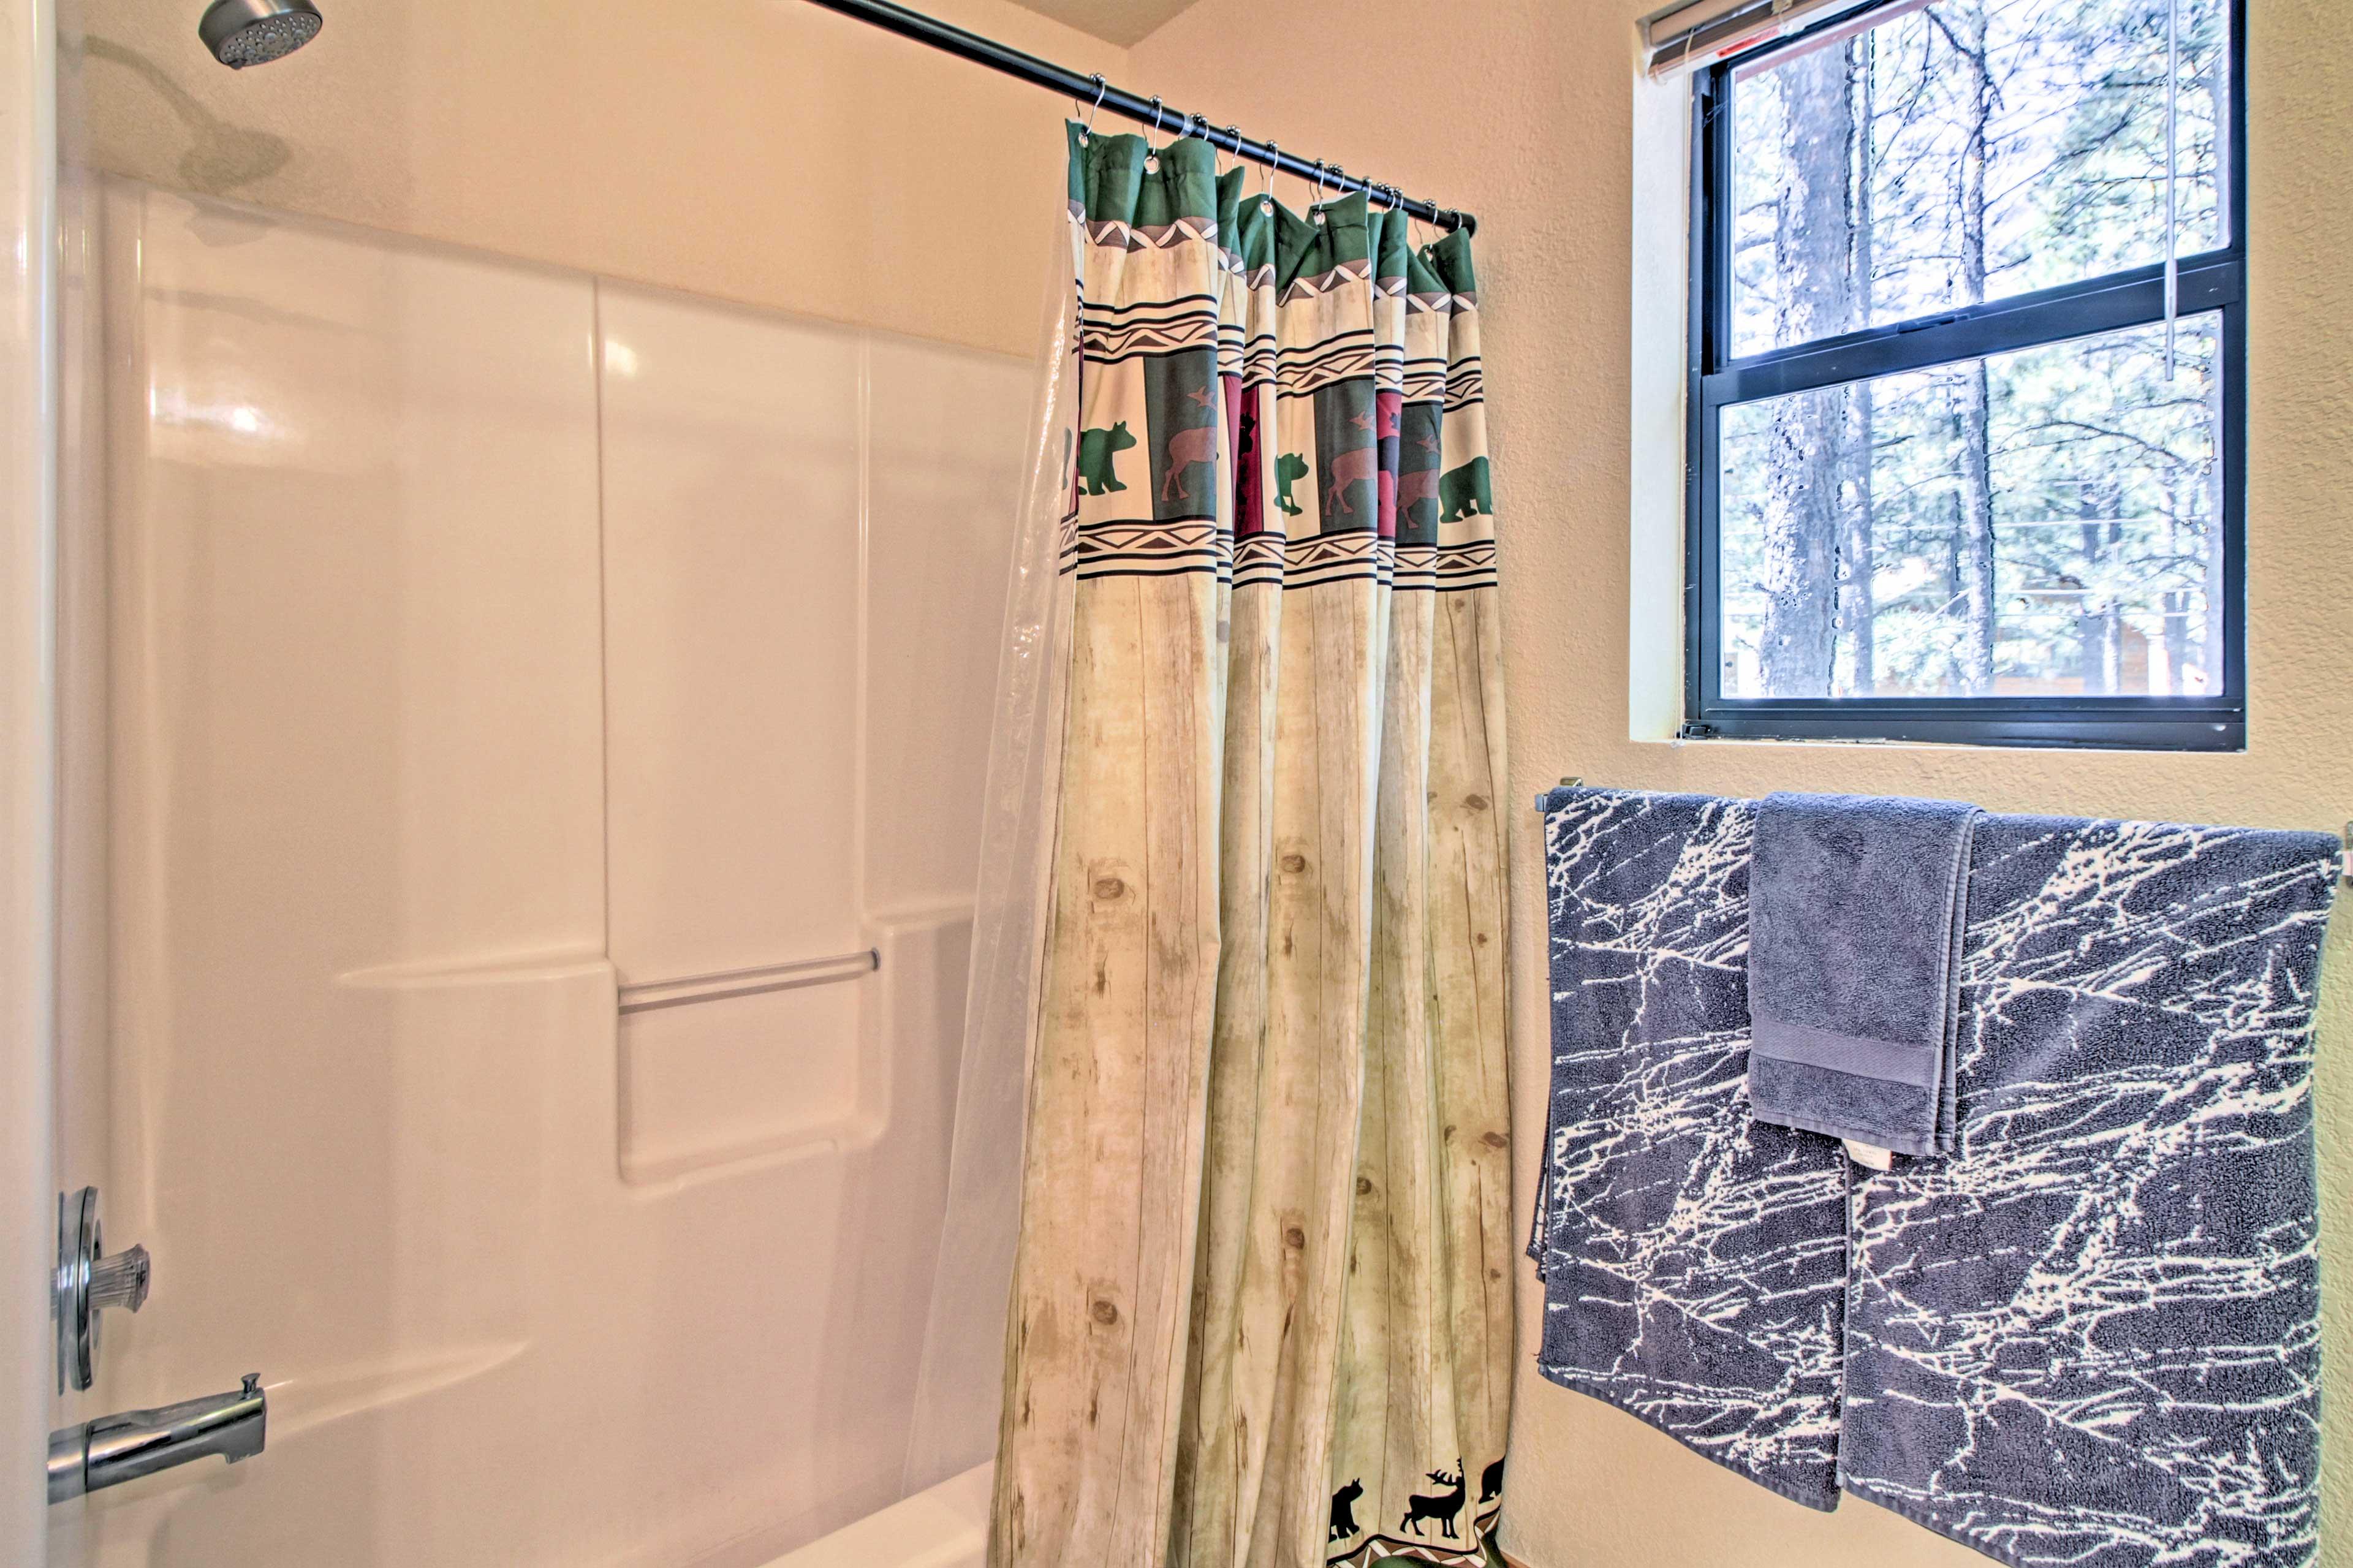 Choose between a soak and a shower.